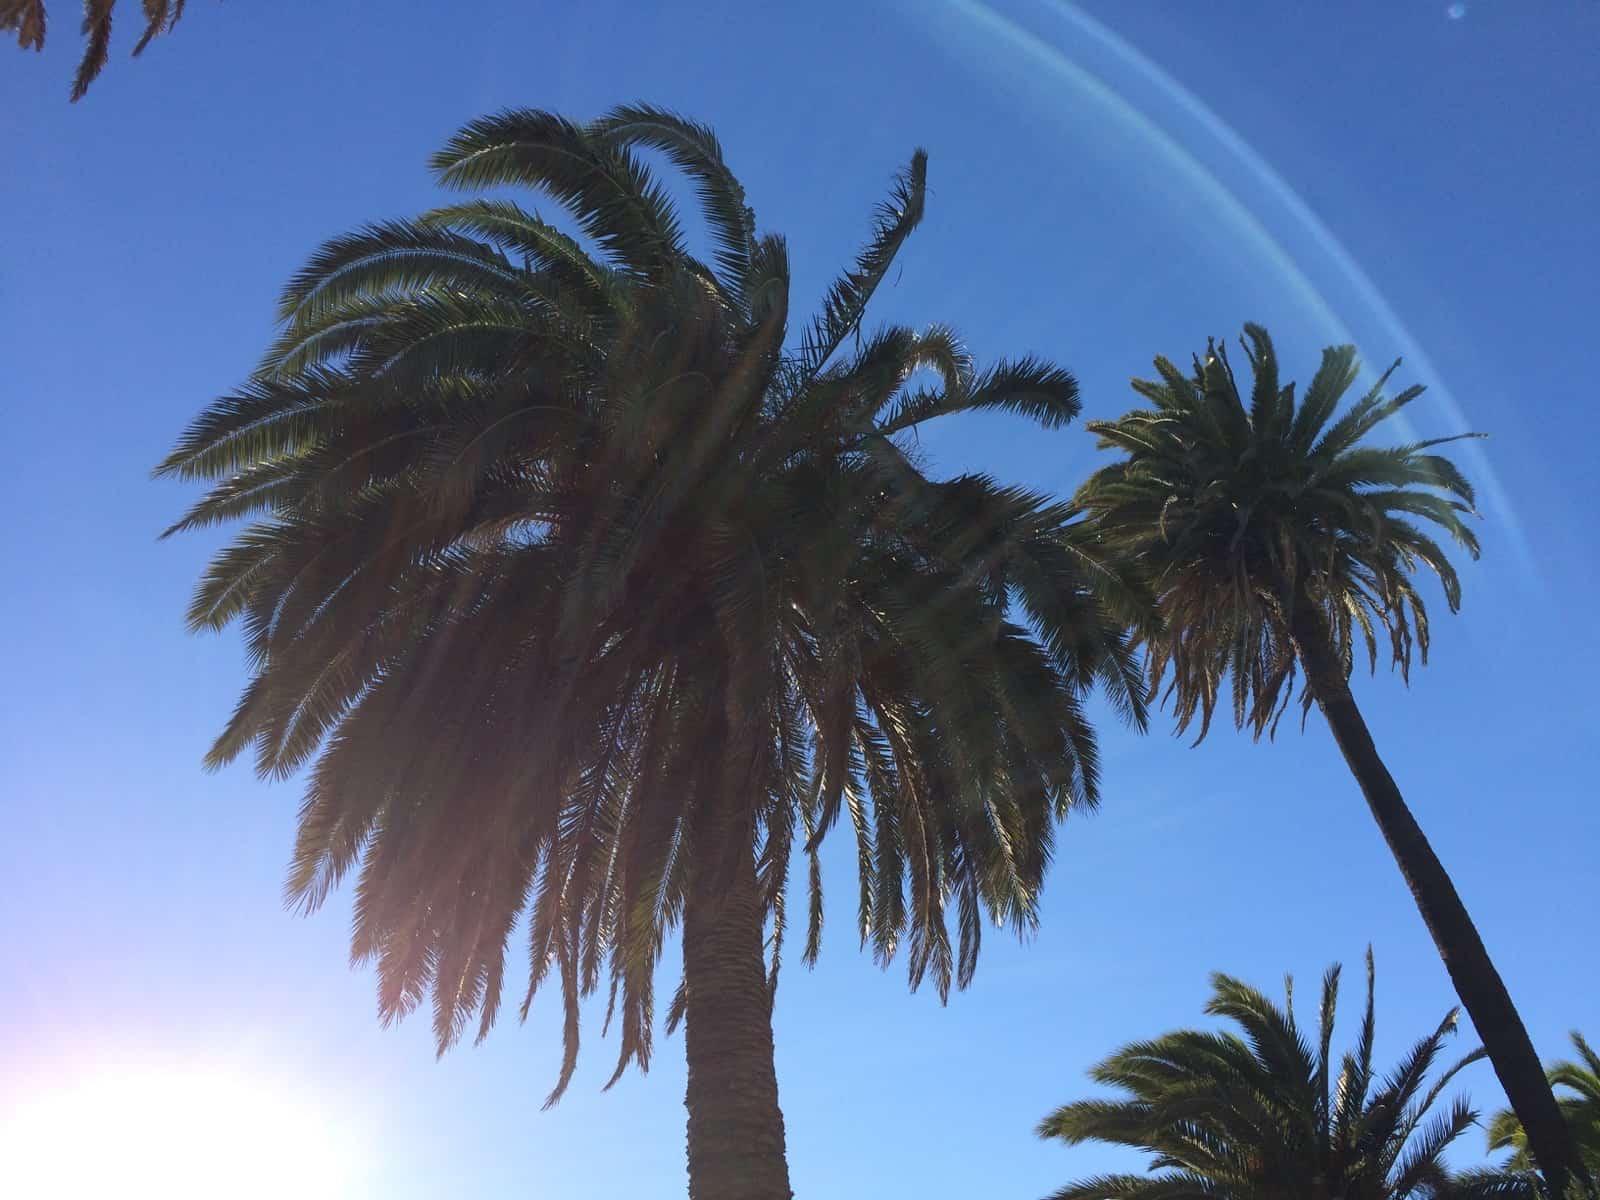 Los Angeles – vielfältiger kann Urlaub kaum sein